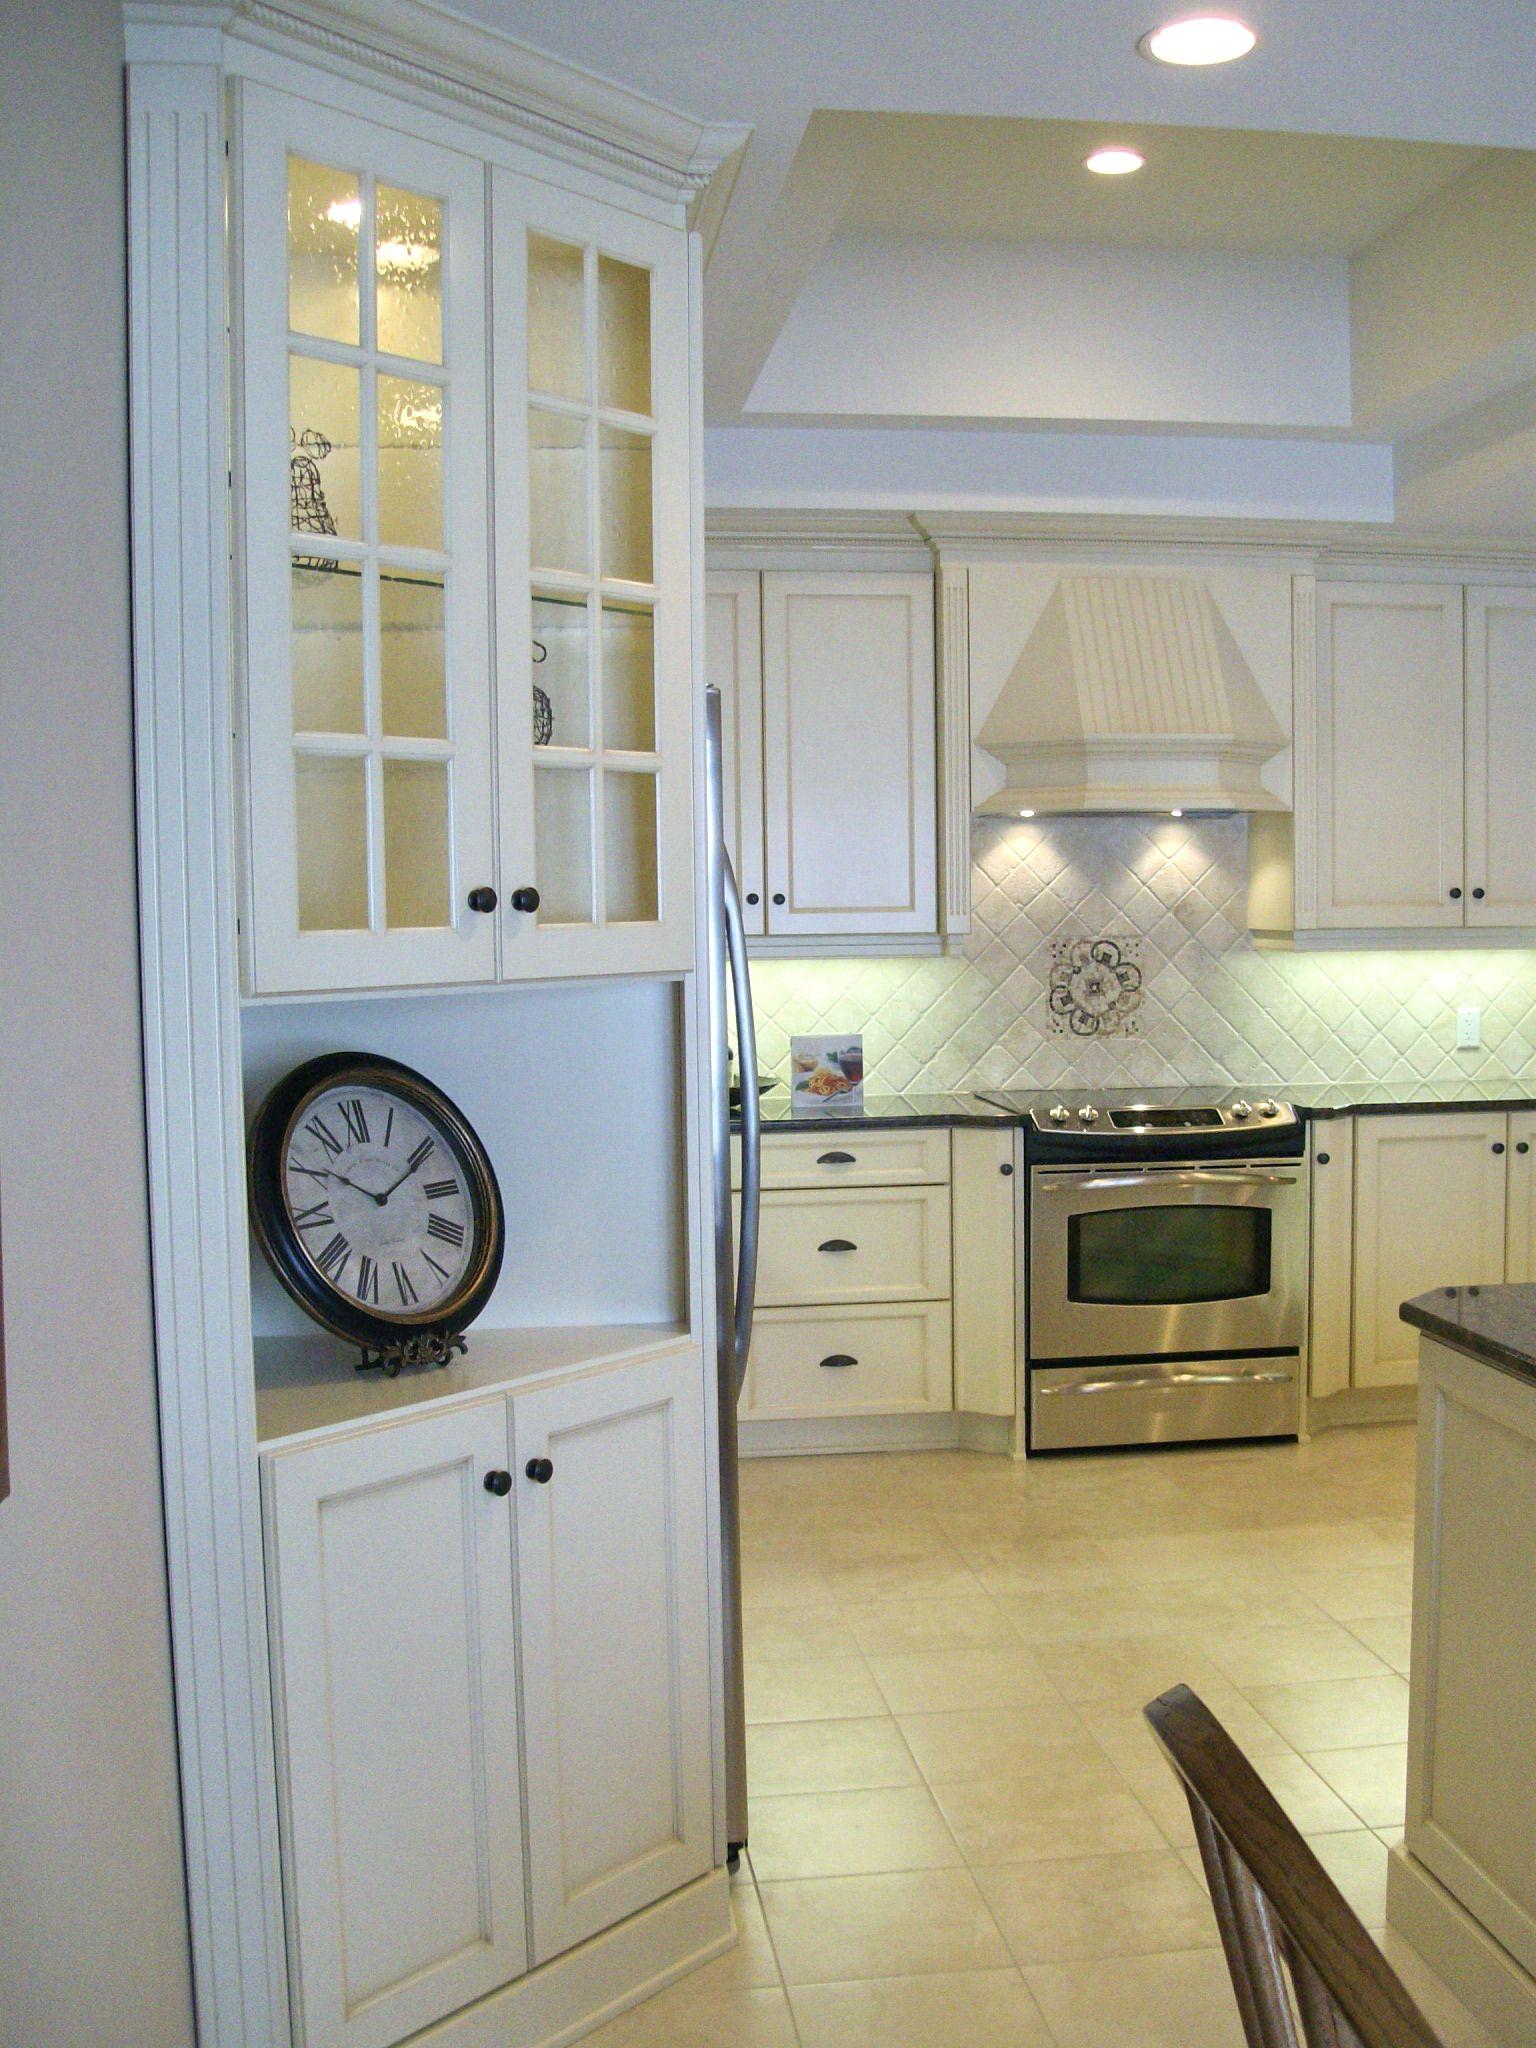 Antique White Lacquer Cabinets Uba Tuba Granite Tops Kitchen Cabinet Colors Kitchen Redo Kitchen Remodel